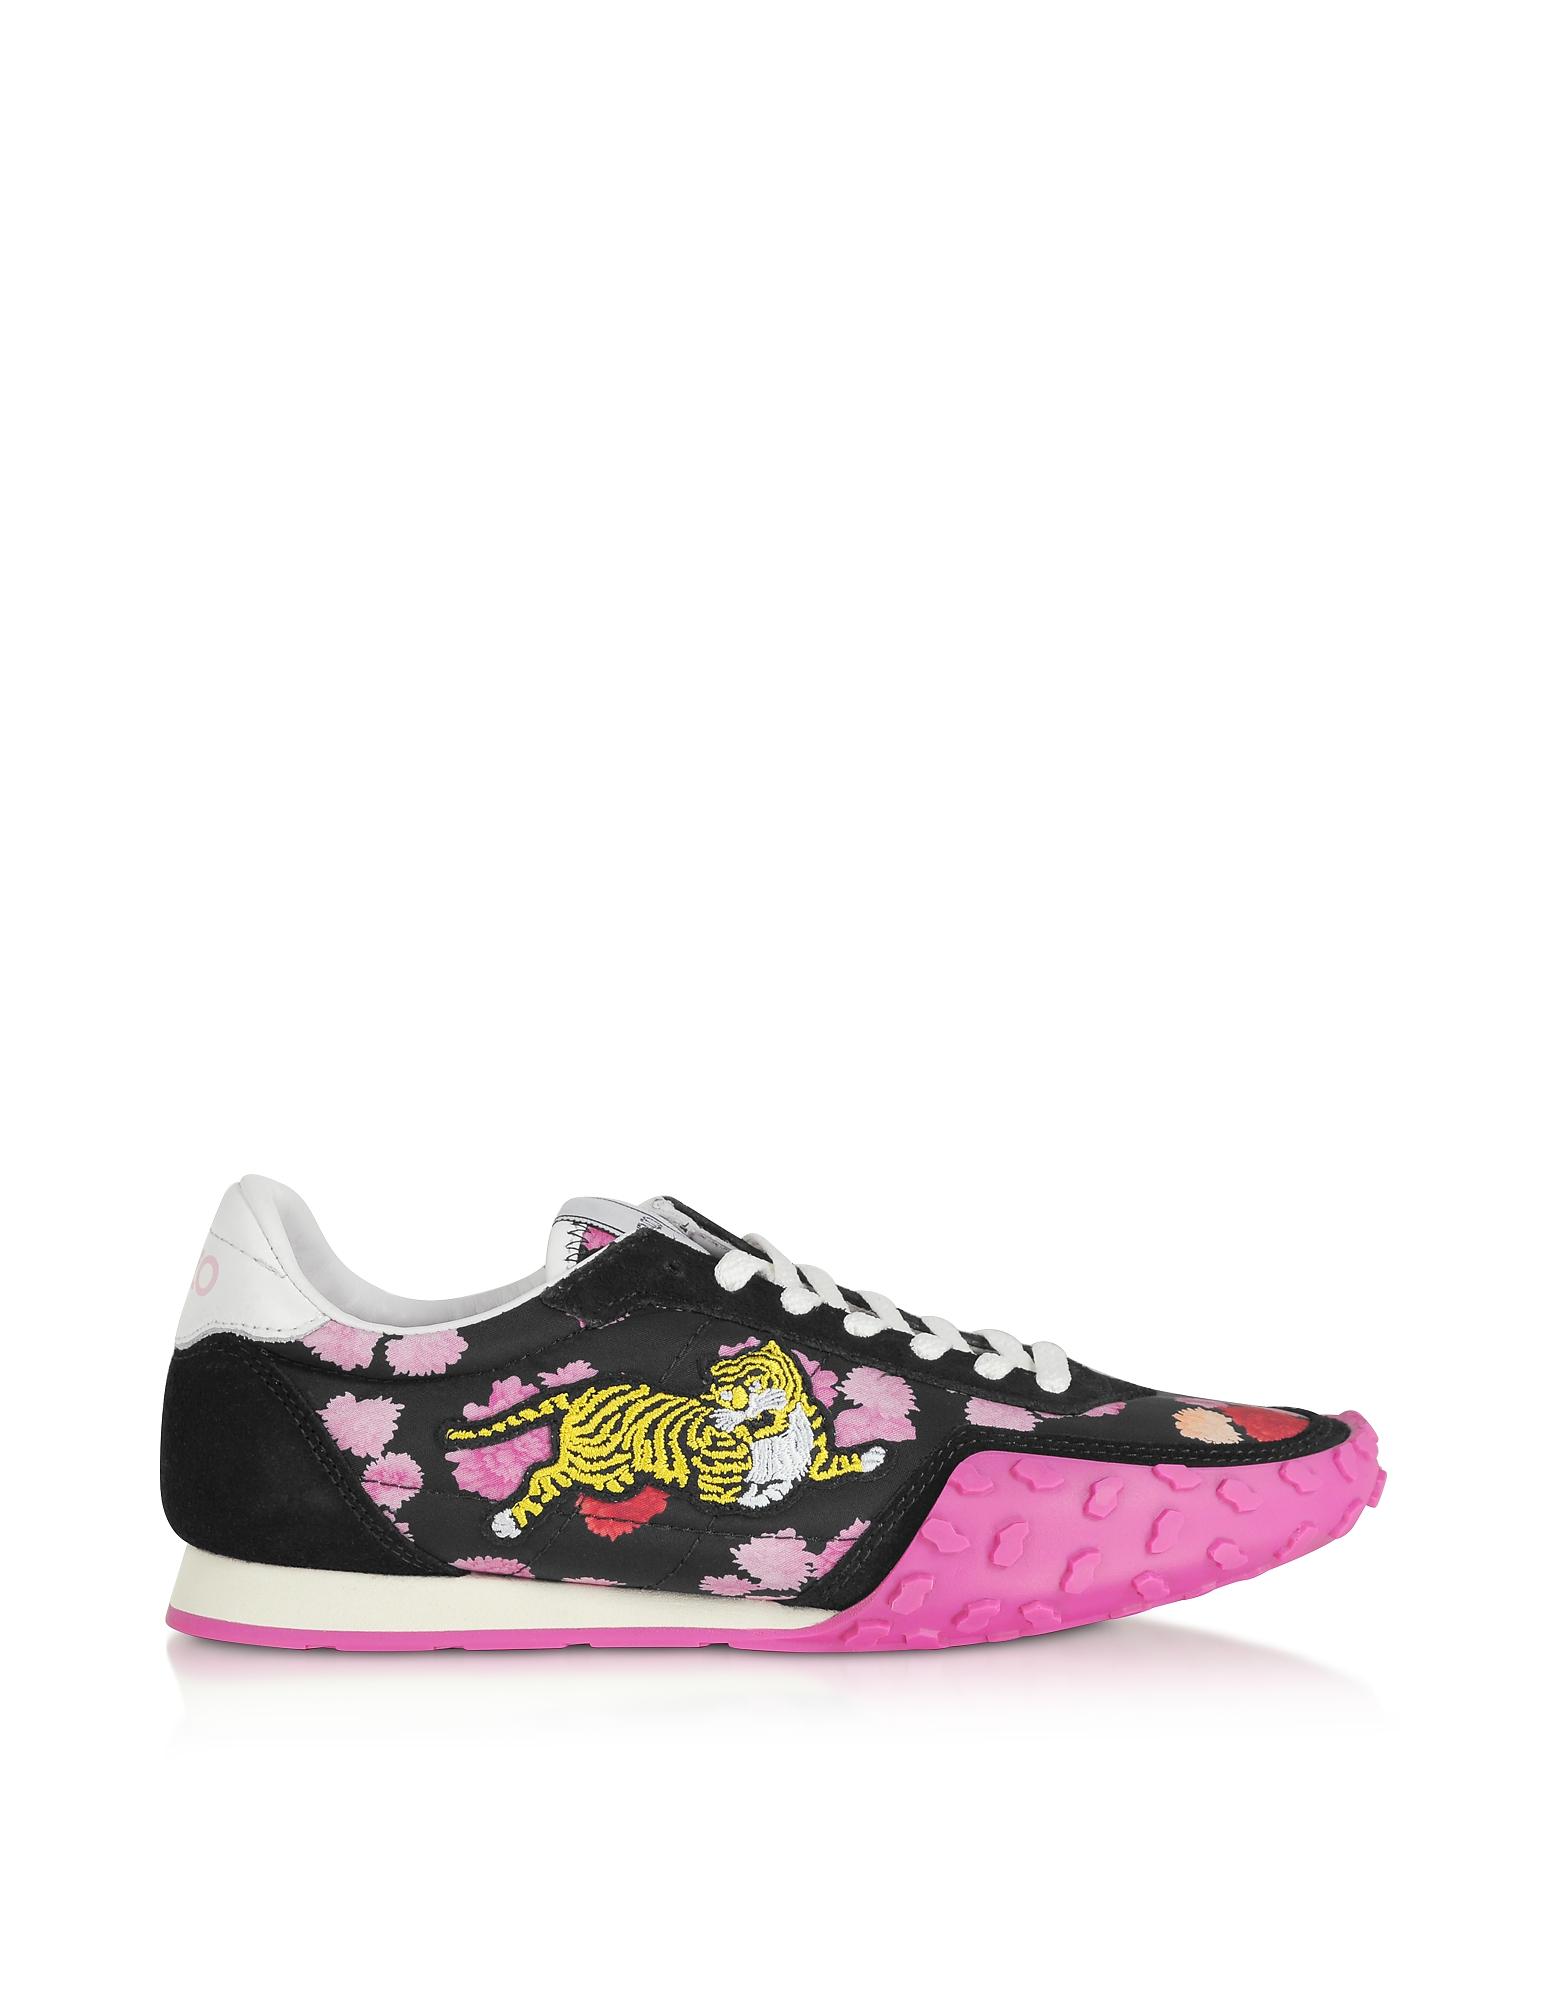 Black and Fuchsia Kenzo Move Women's Sneakers